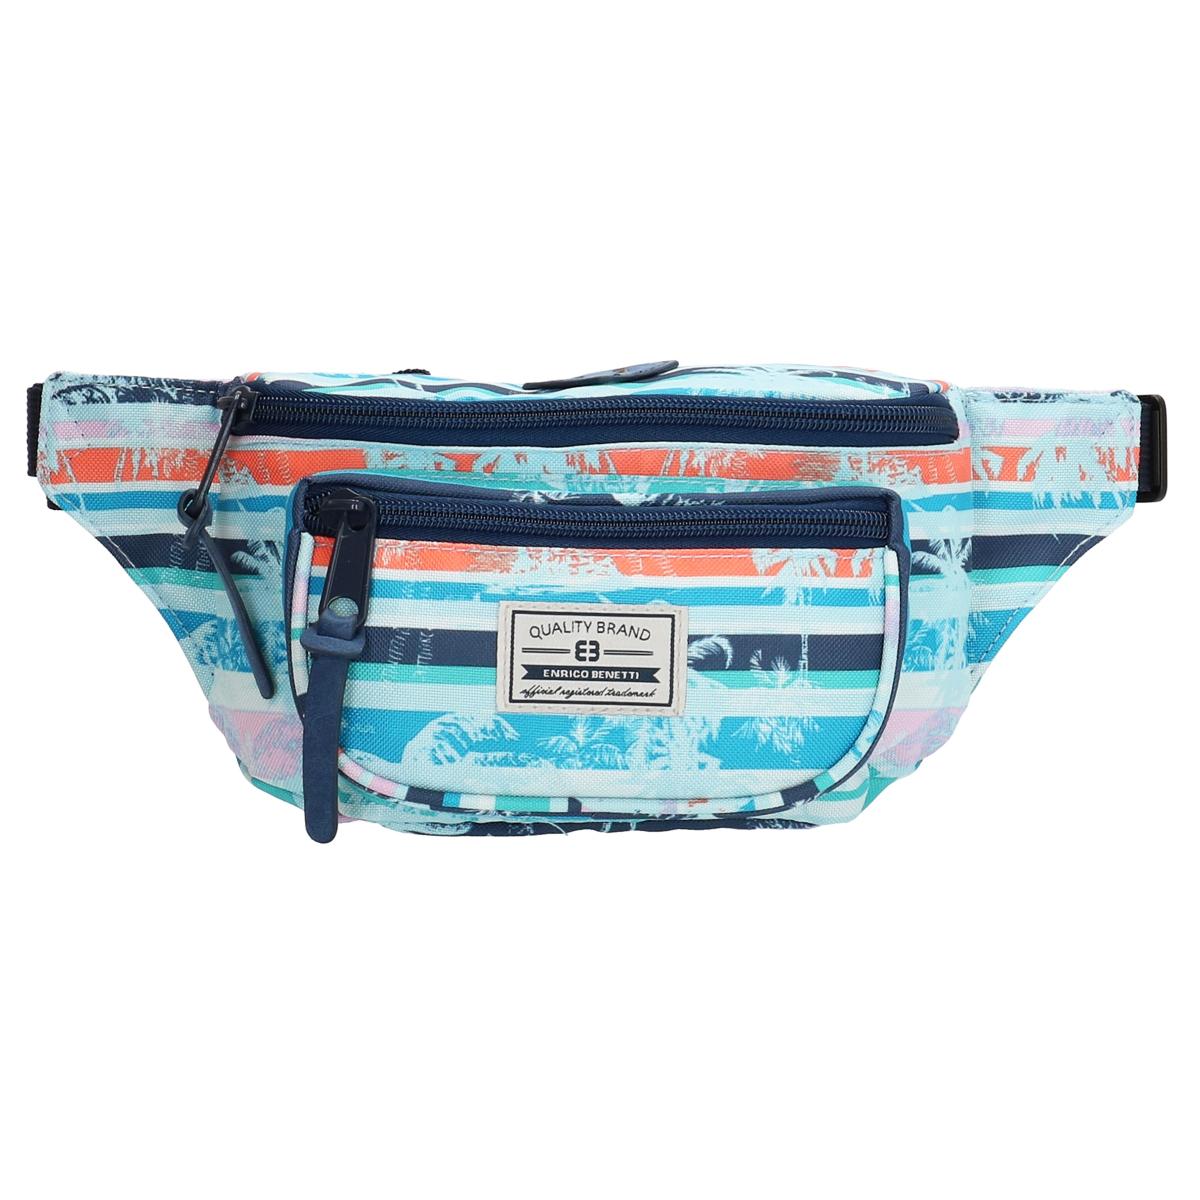 Pochette ceinture / banane \'Enrico Benetti\' bleu tropical - 32x12x65 cm - [Q1755]